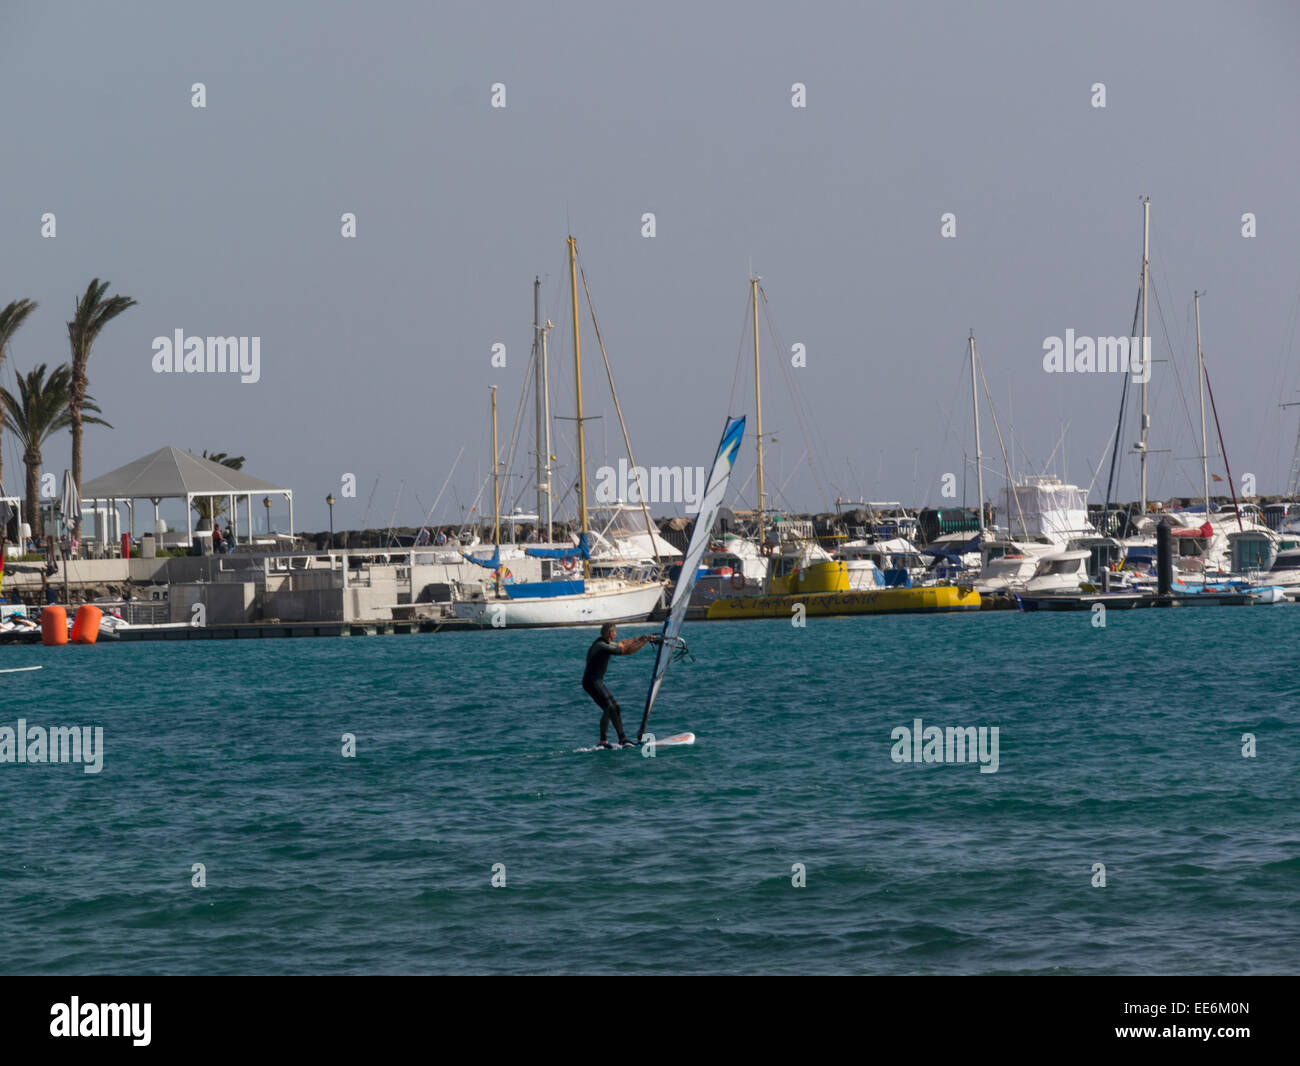 Man wind surfing  Caleta de Fuste Fuerteventura Canary Islands - Stock Image